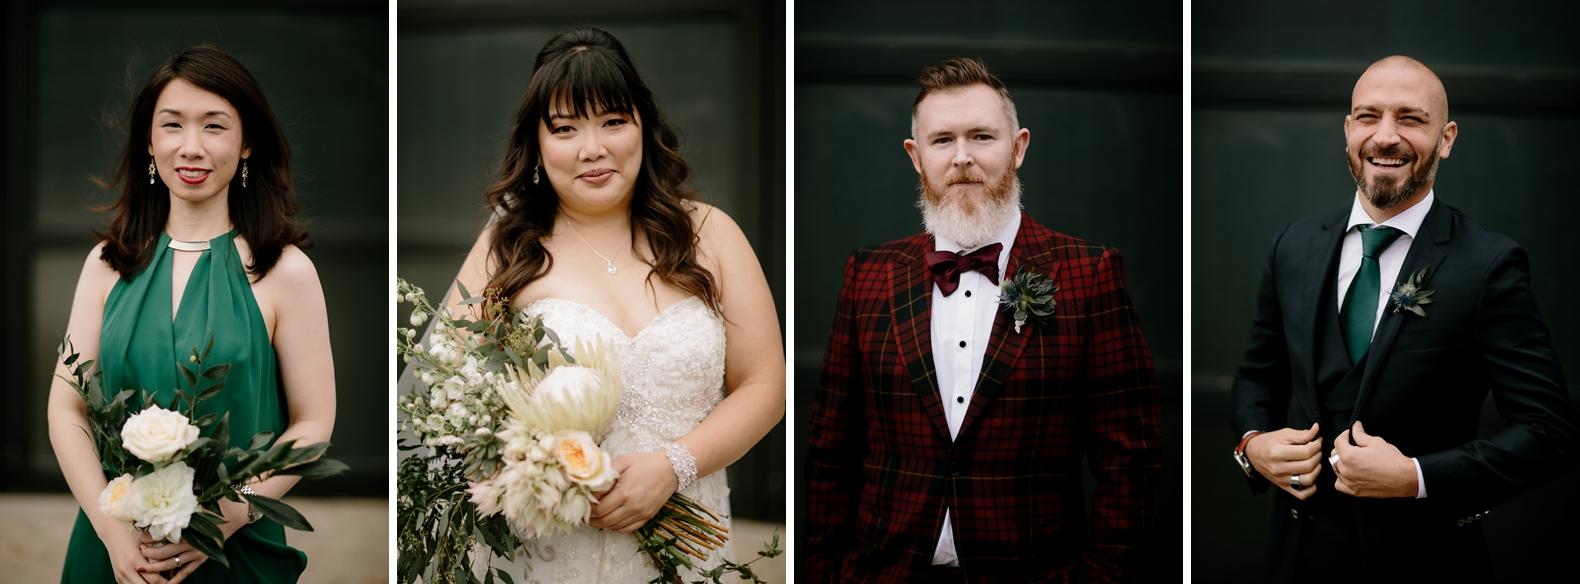 501-union-wedding-0055